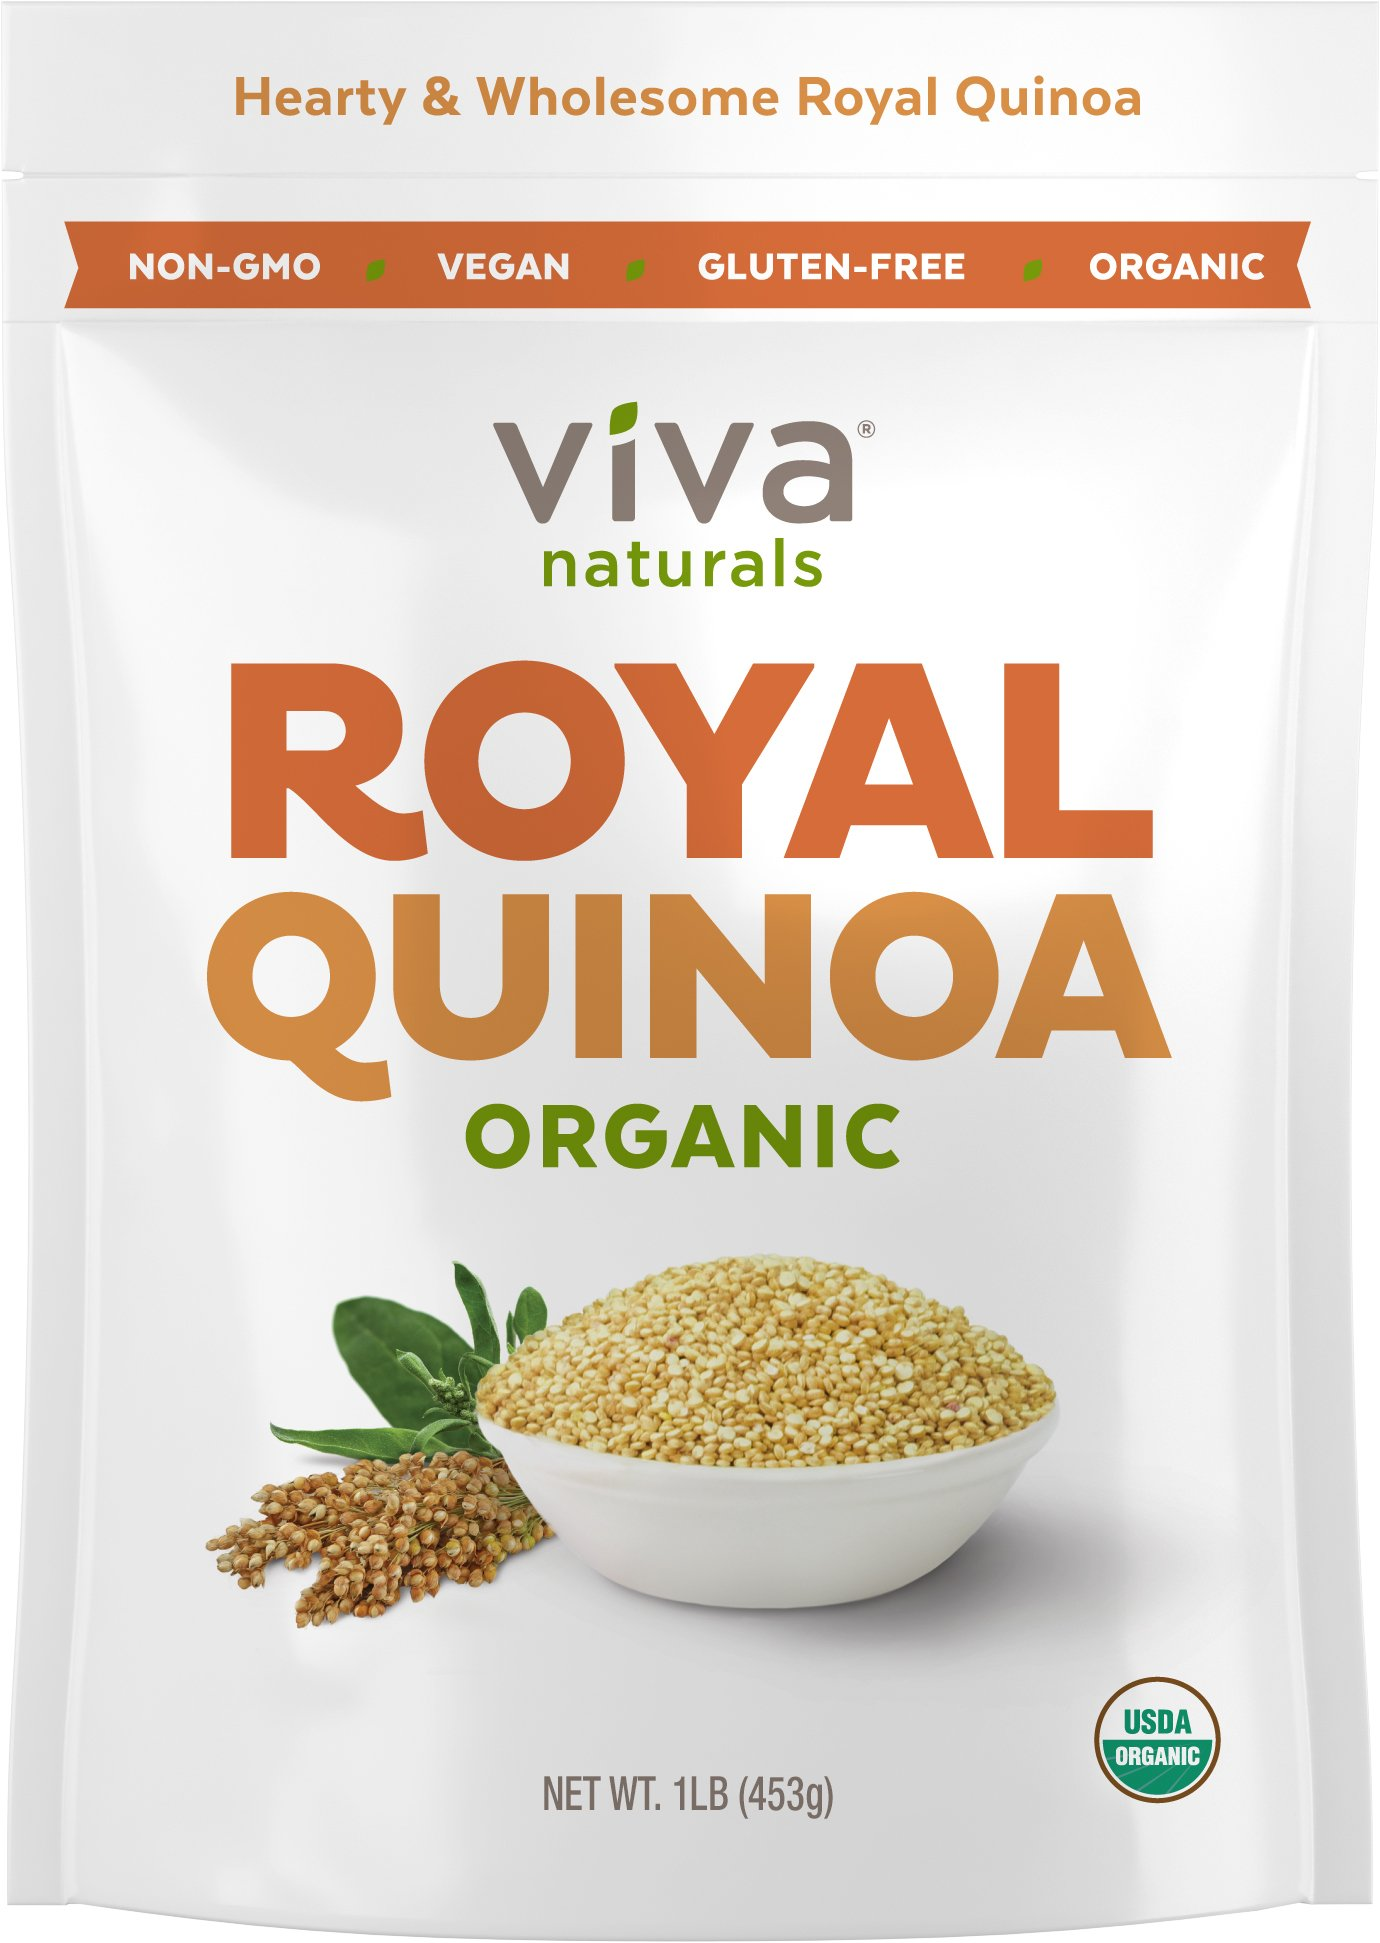 Viva Naturals - The FINEST Organic Quinoa, 100% Royal Bolivian Whole Grain, 1 LB Bag by Viva Naturals (Image #3)